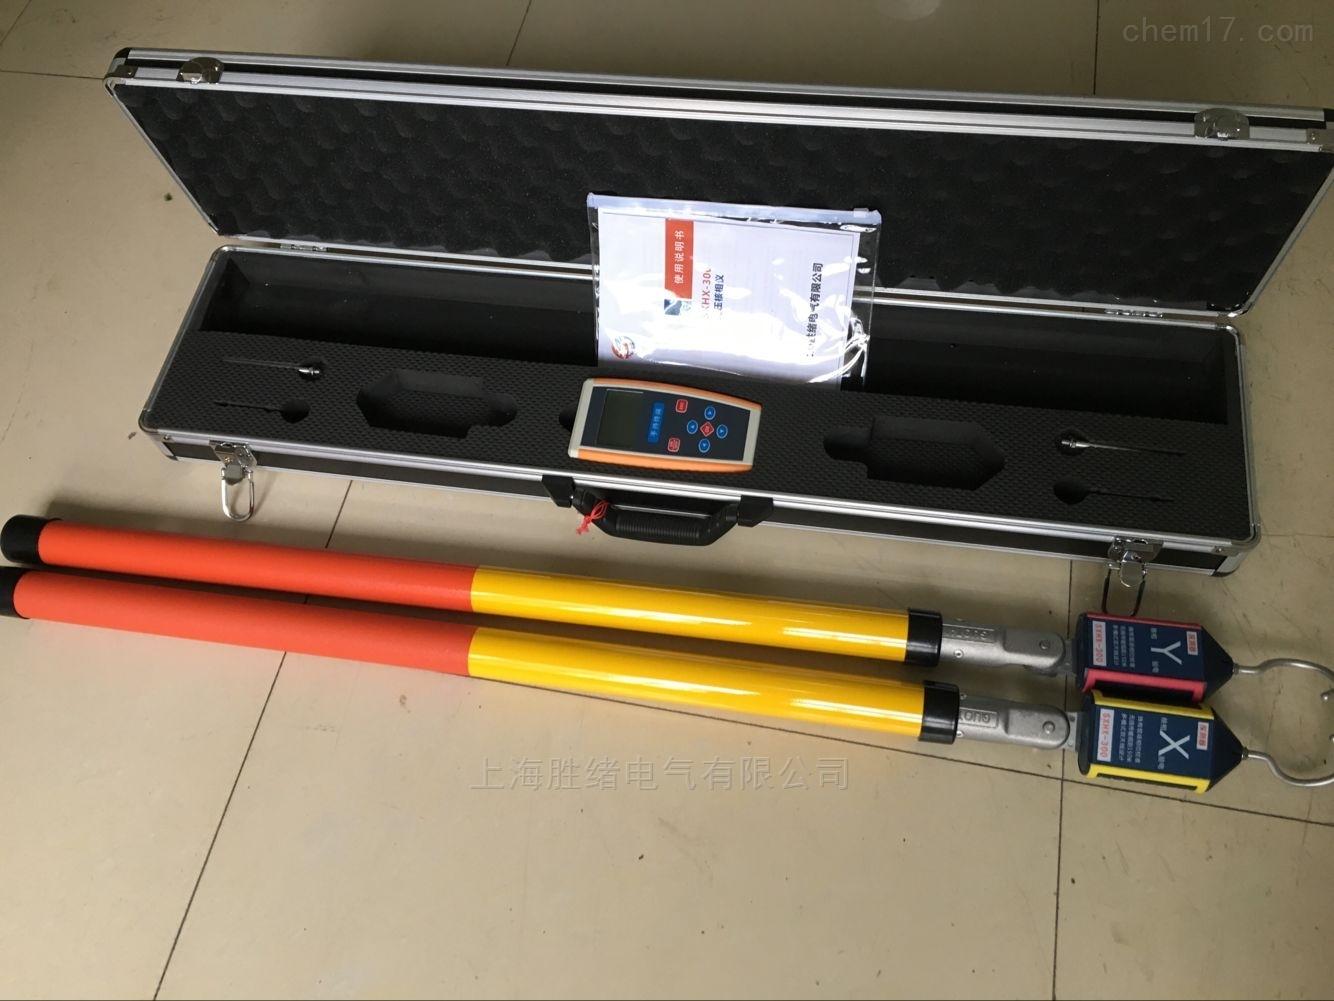 JHTAG-9000远程无线高压核相器